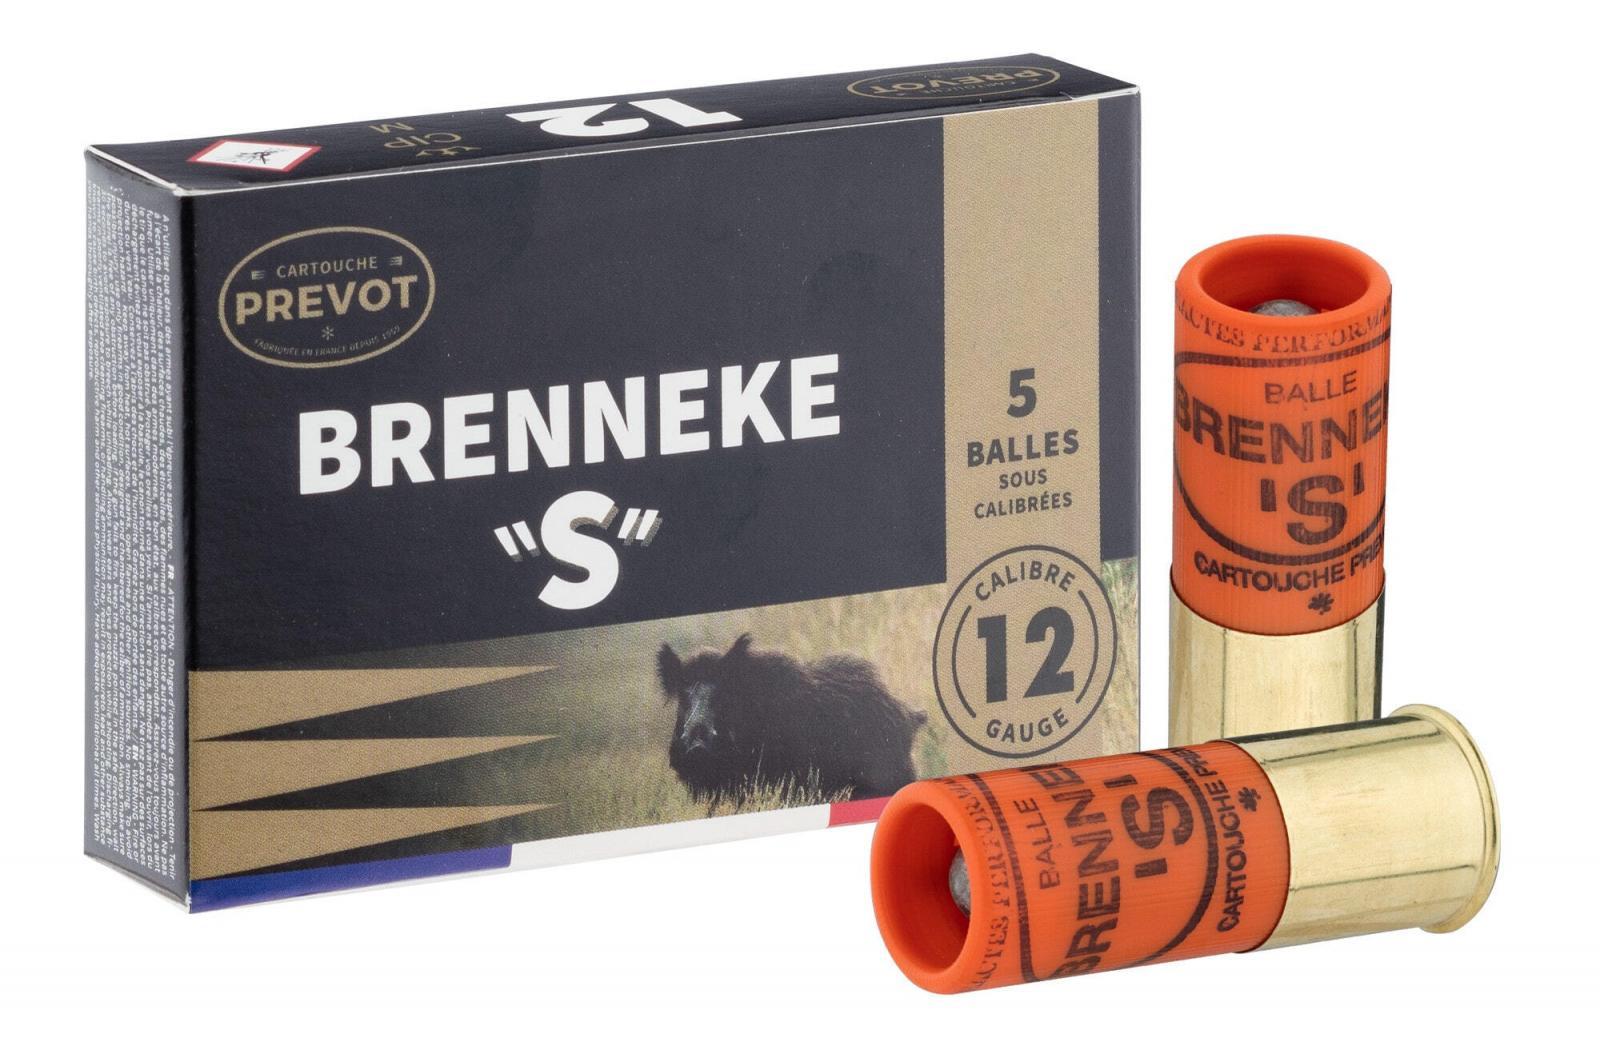 "Boite de 10 balles BRENNEKE ""S"" calibre 12 / 70 BR1S"